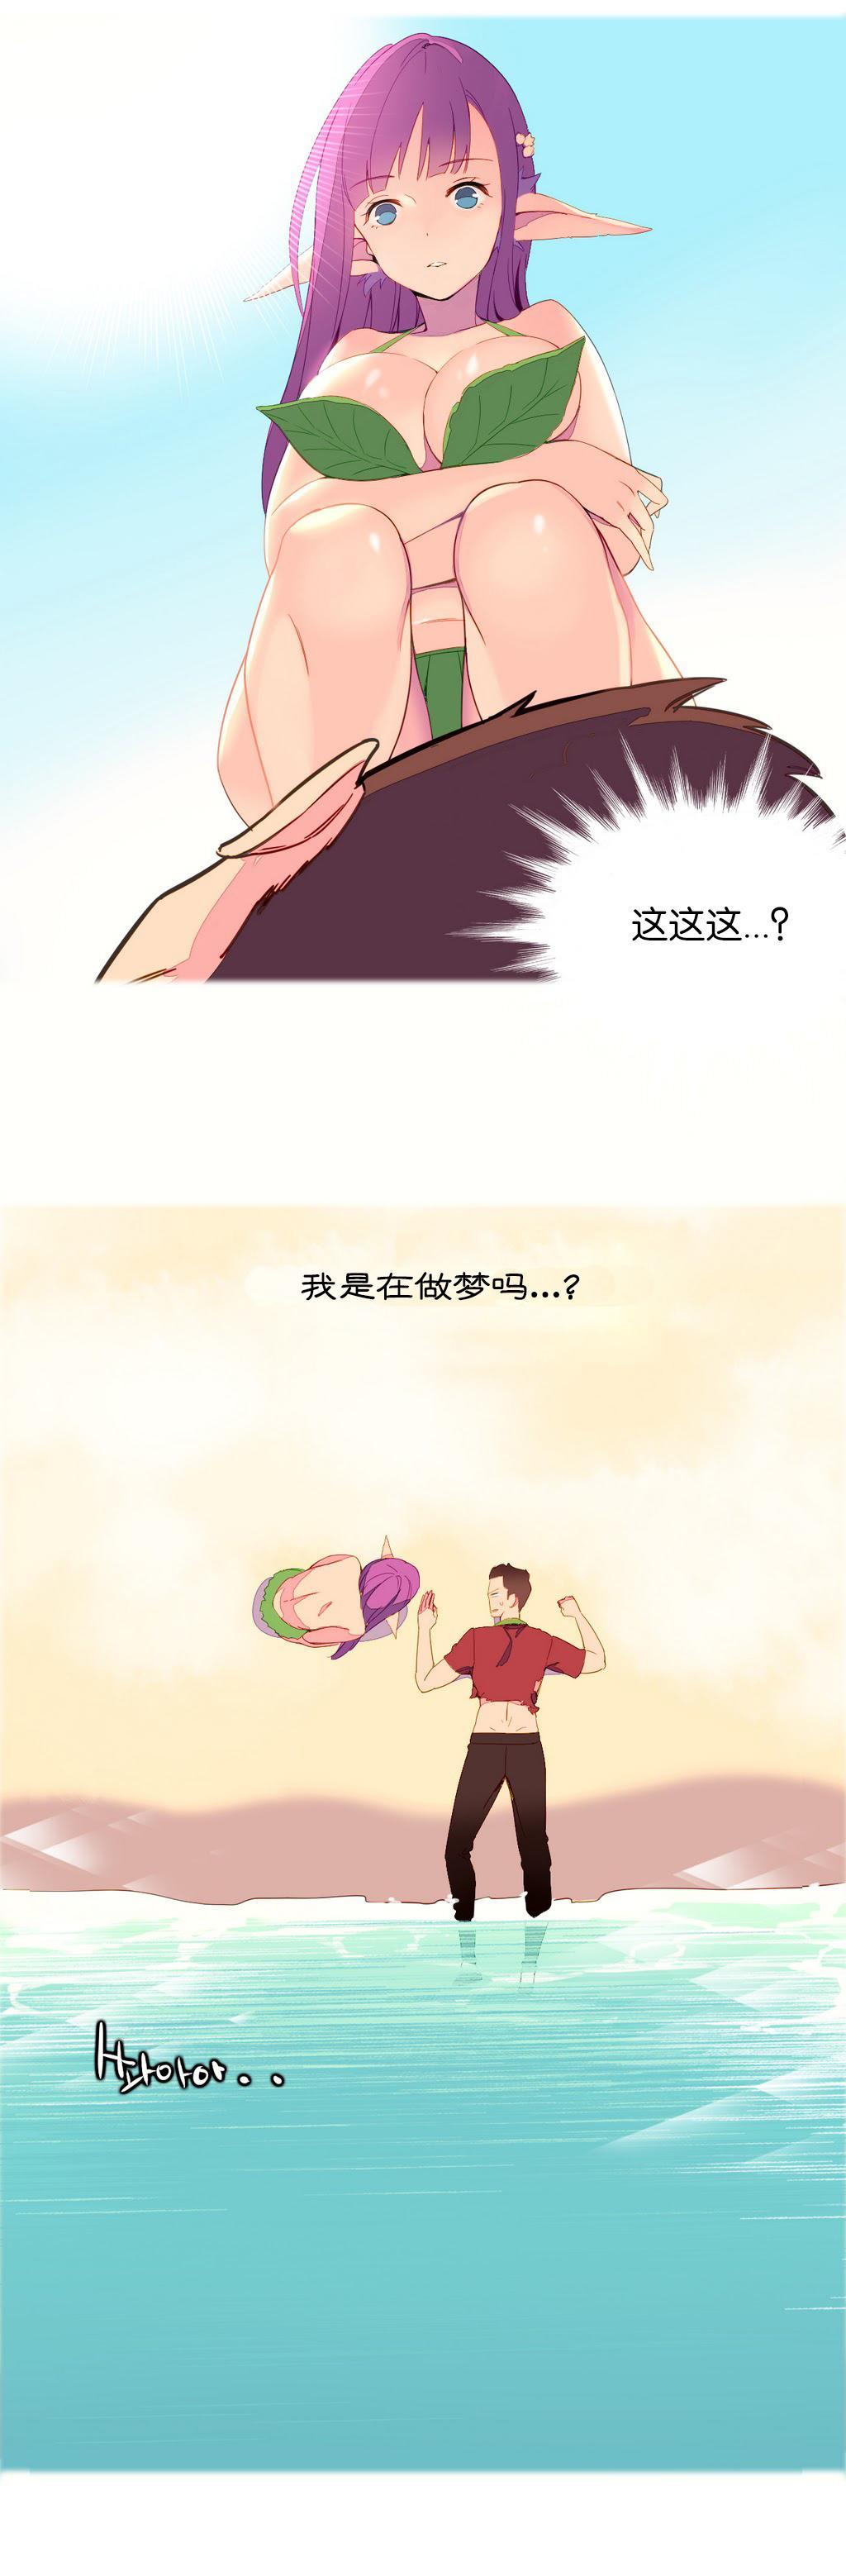 [Rozer] 一个由我统治的世界(A World that I Rule) Ch.1-3 [Chinese] 41